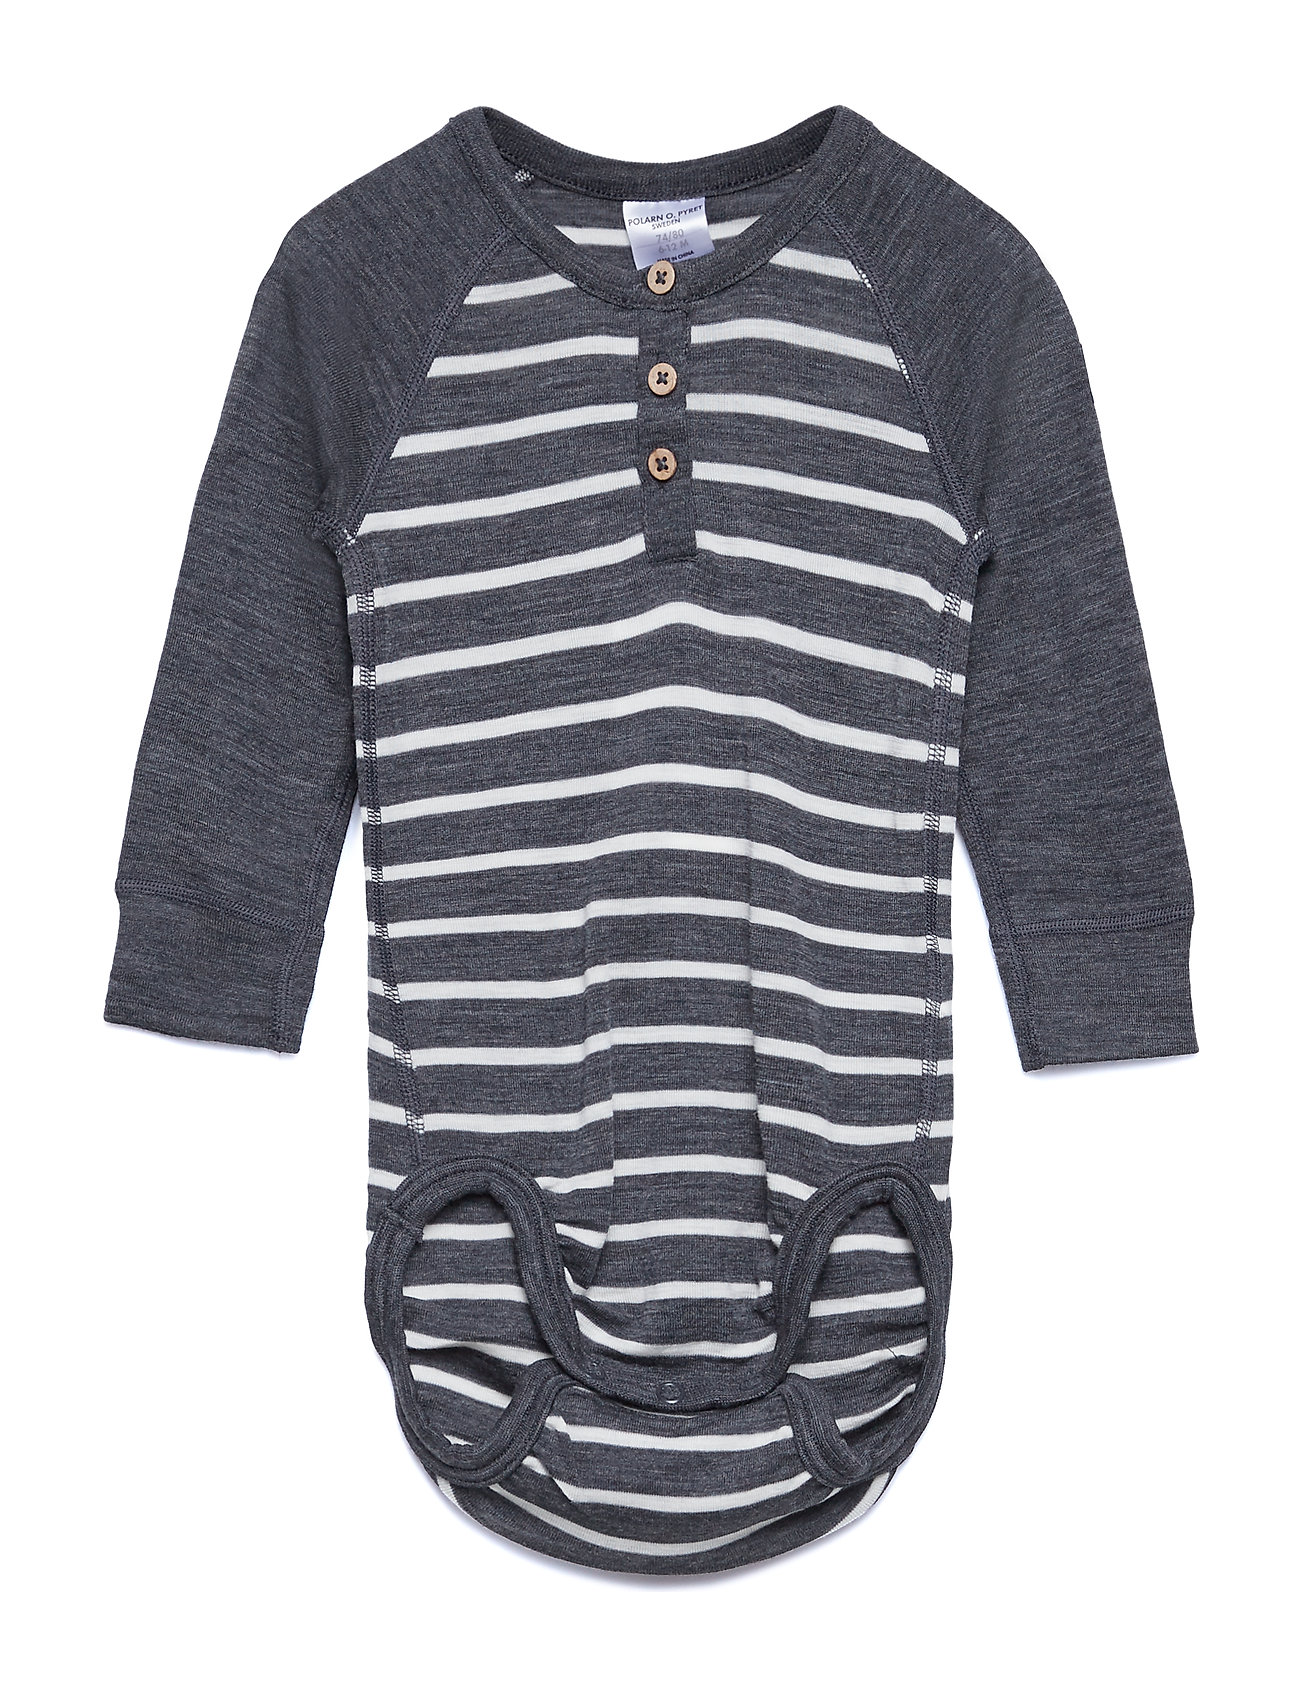 Polarn O. Pyret Body Wool Striped Baby